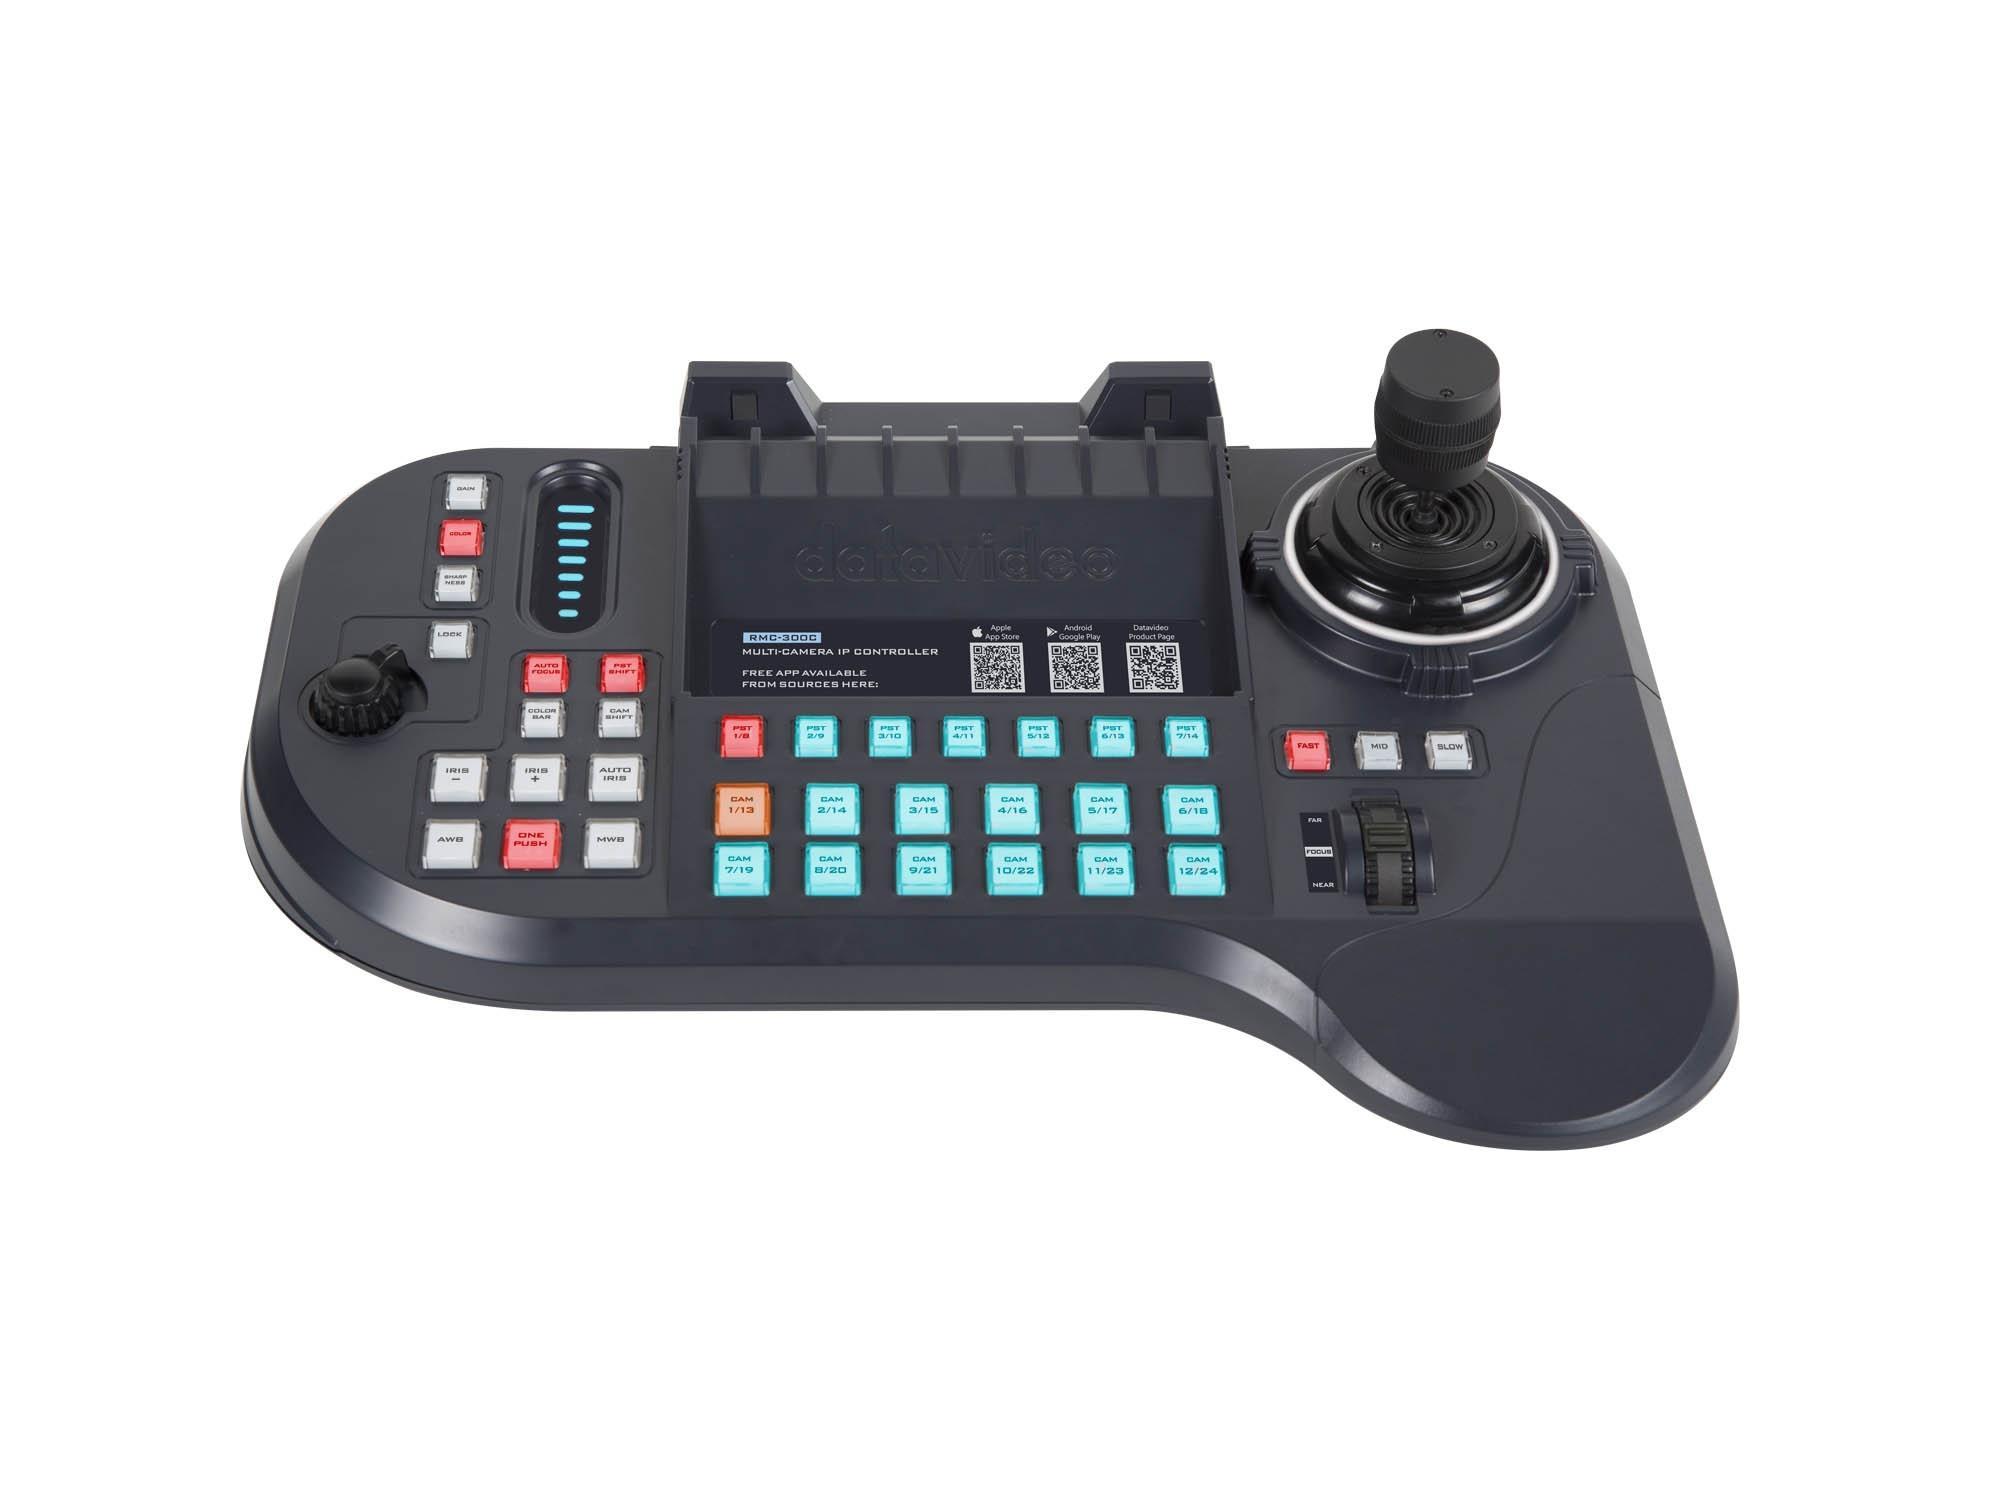 Datavideo RMC-300C Multi-Camera IP Controller